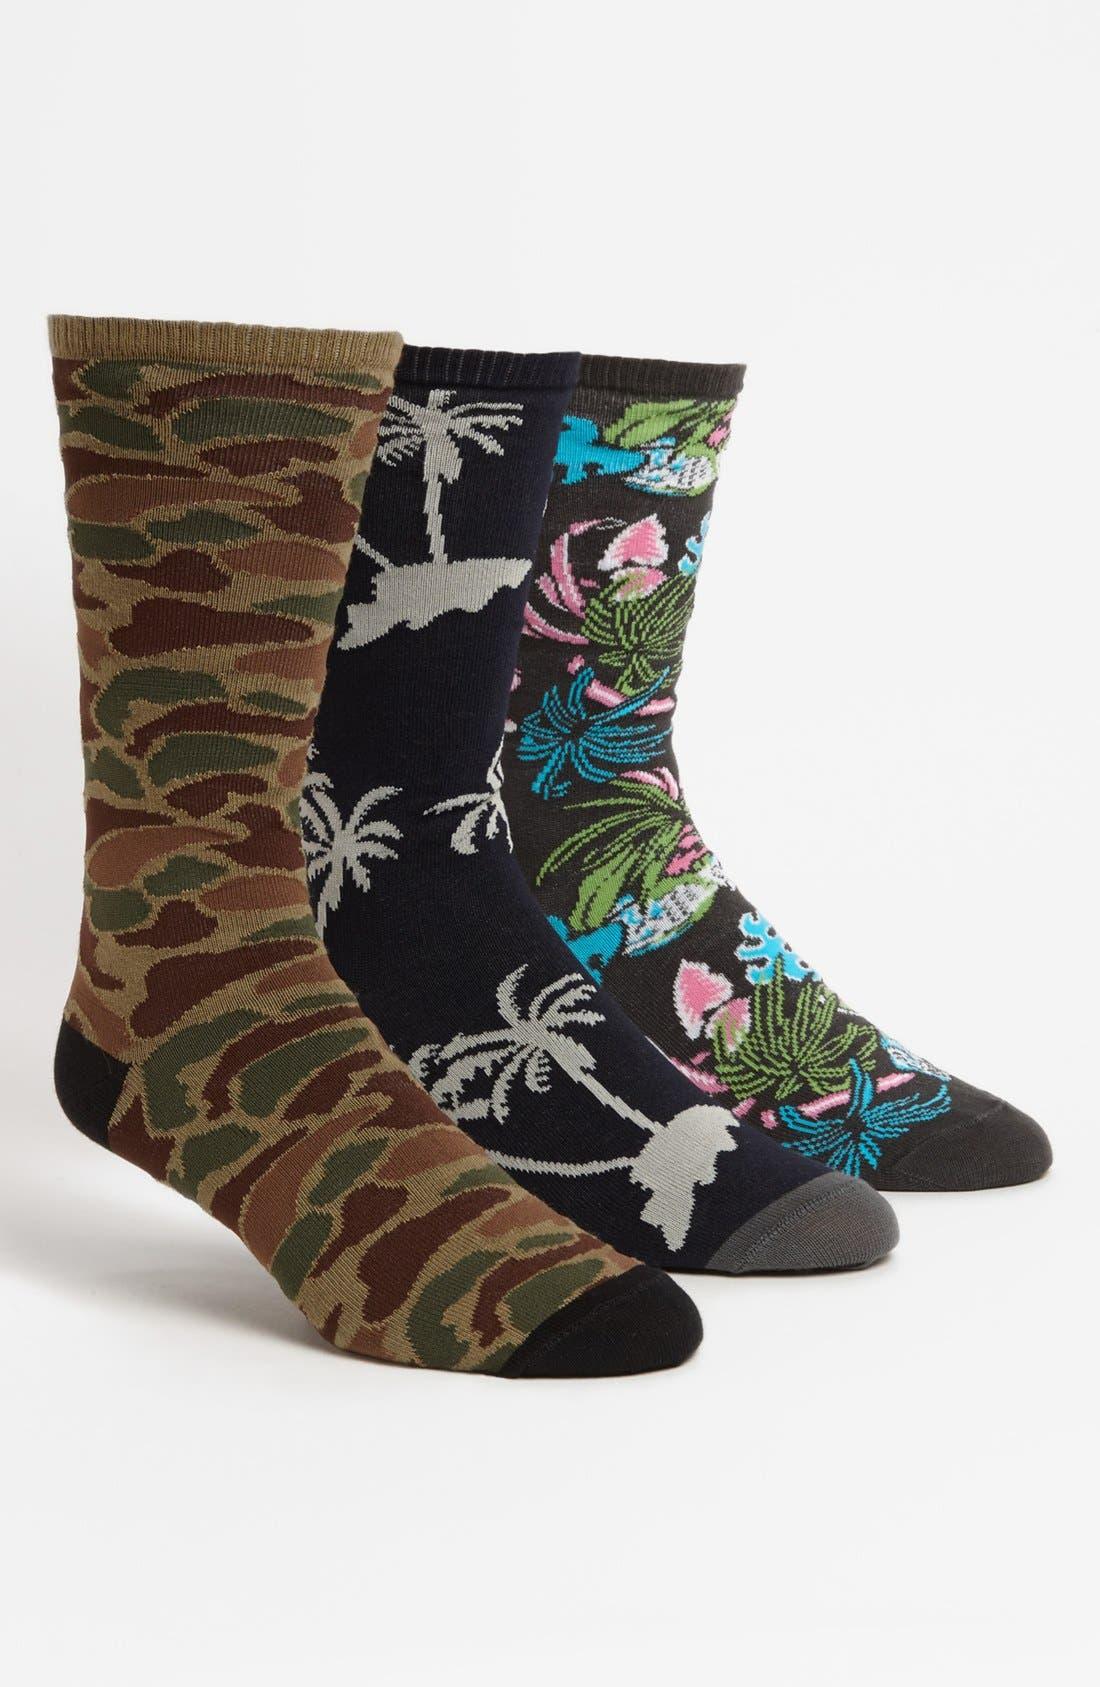 Main Image - Vans 'Willits' Socks (Assorted 3-Pack)